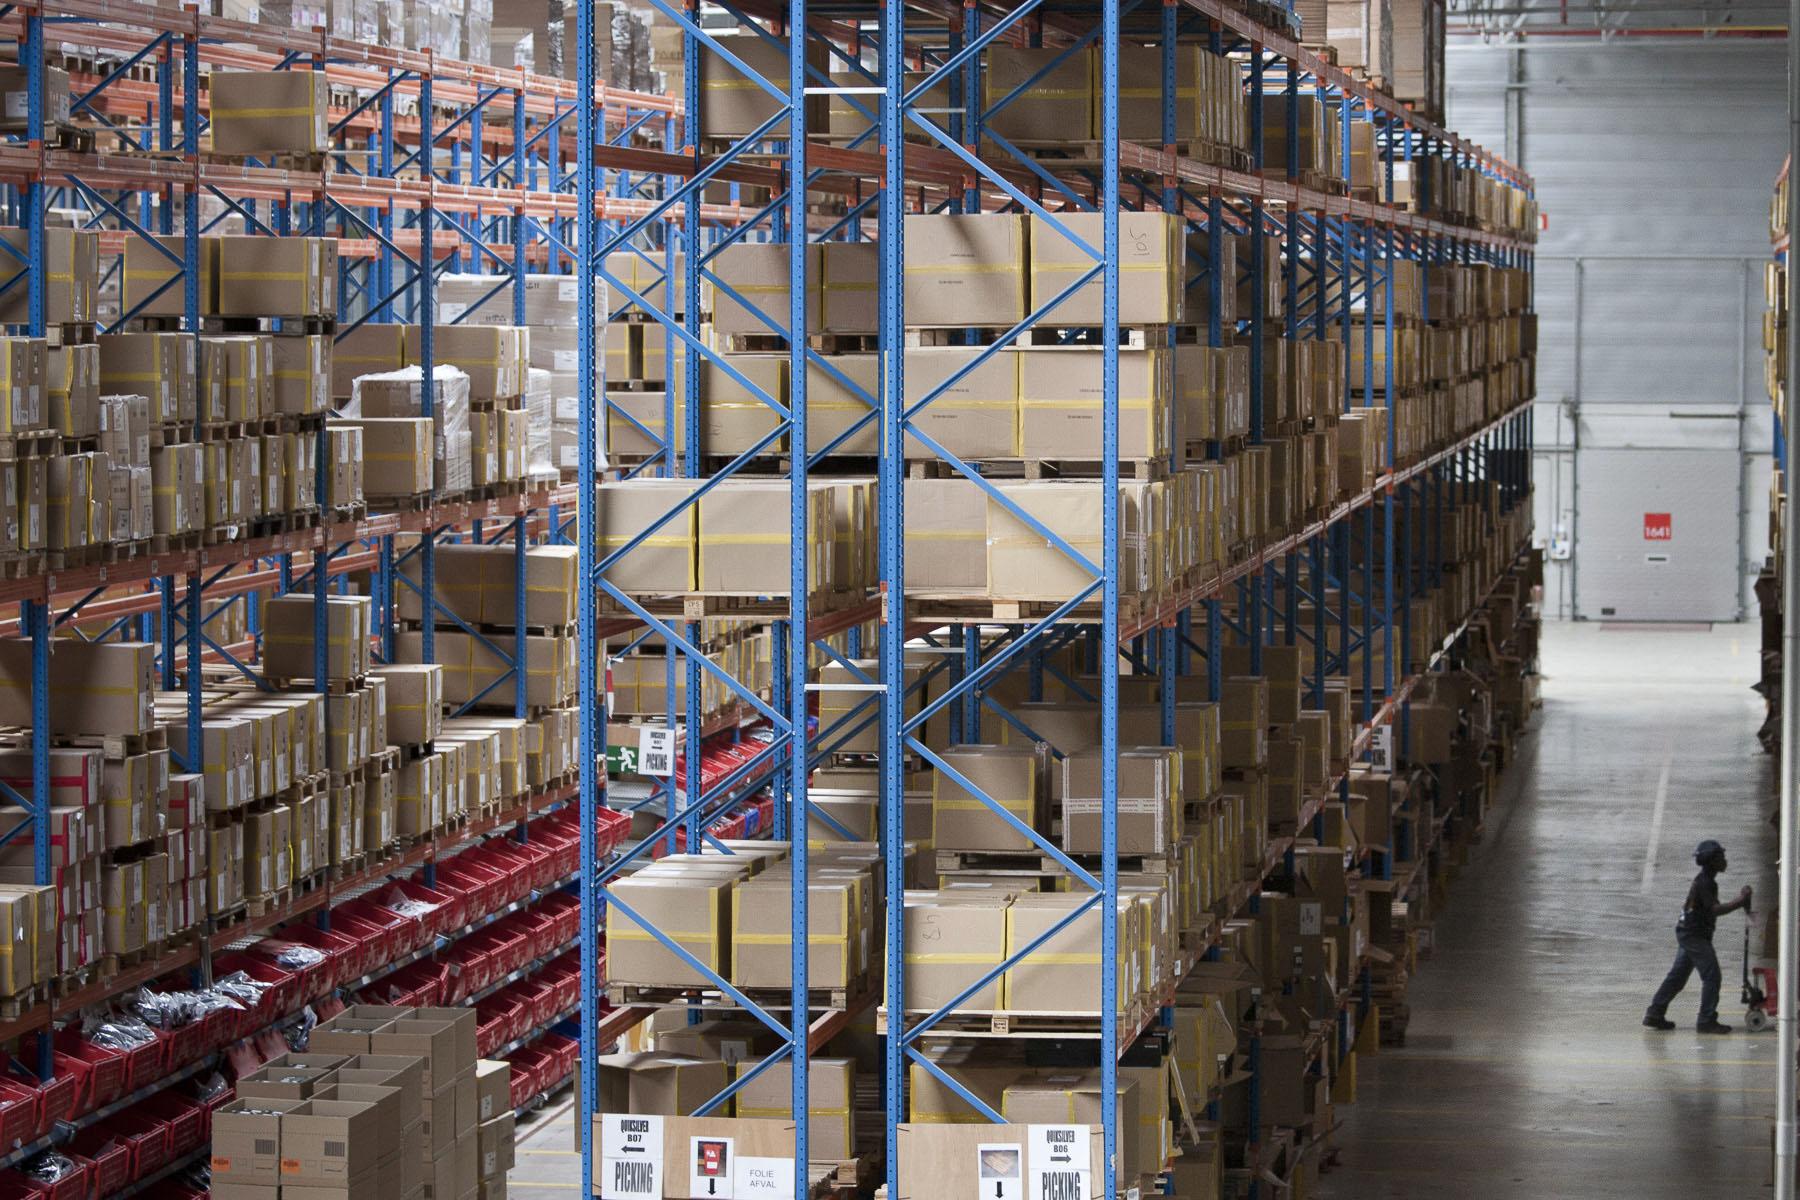 The Katoen Natie warehouses, n° 1 logistics provider in the port of Antwerp in July 2010